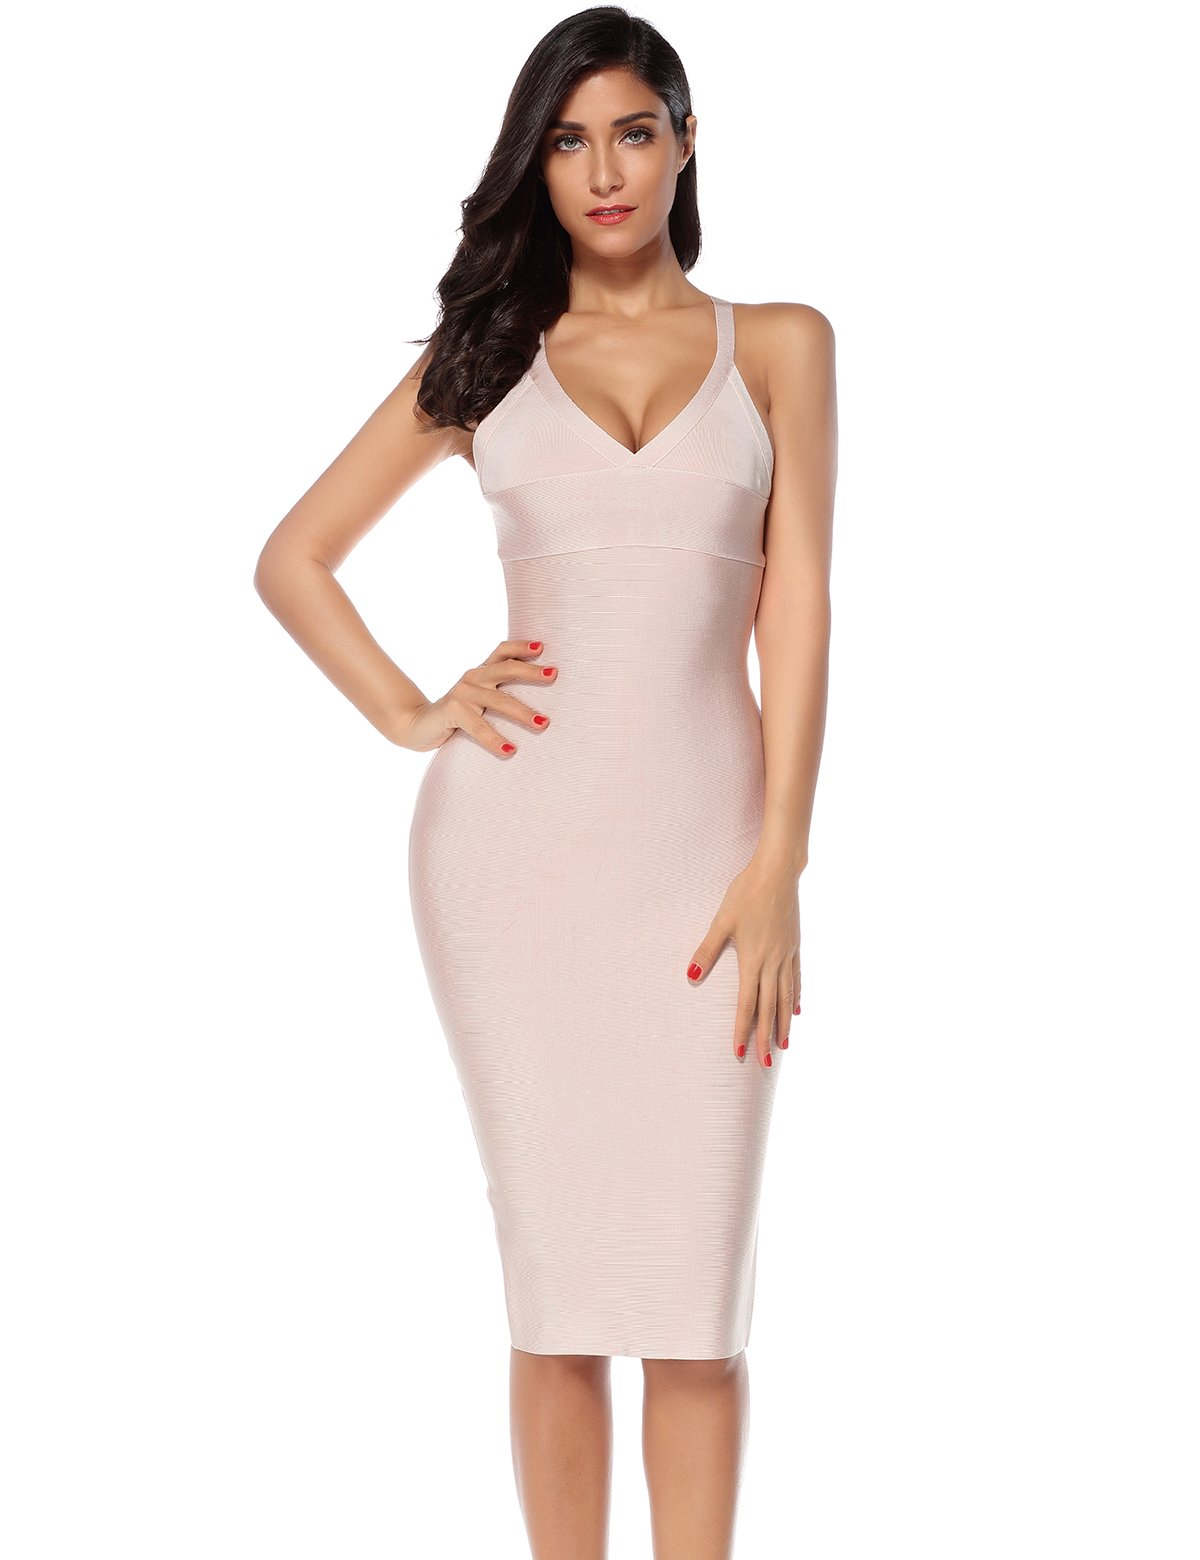 Meilun Women's V Neck Strap Midi Length Bodycon Bandage Party Dress